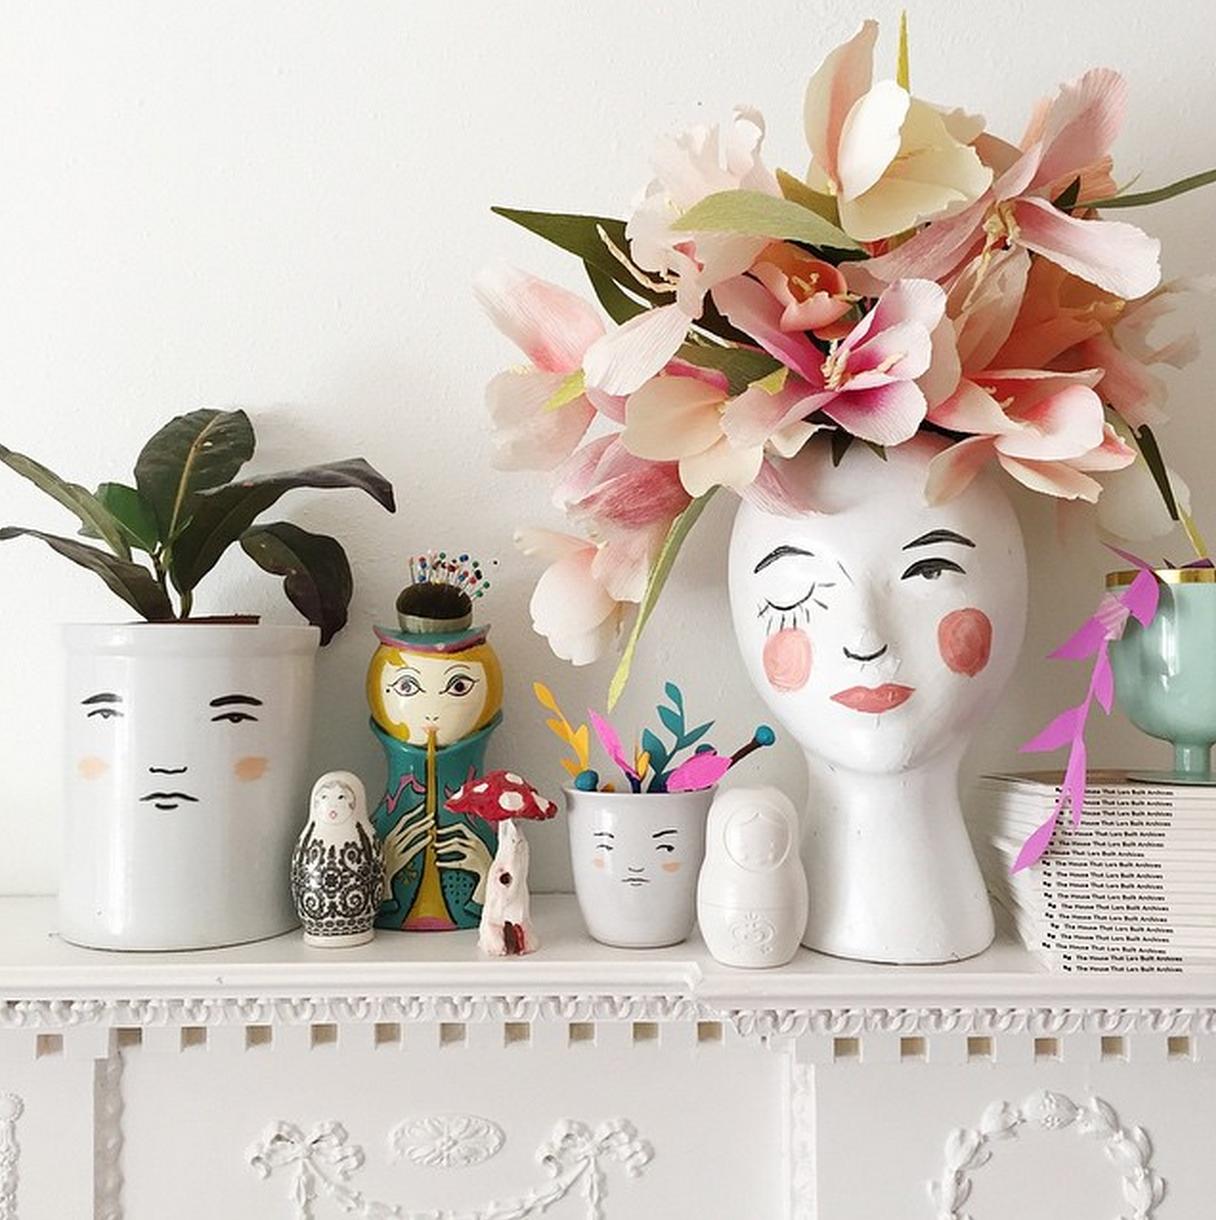 Motherfather Family Vase Human Face Crude Pottery Etsy In 2020 Flower Pots Unique Garden Art Unique Vases